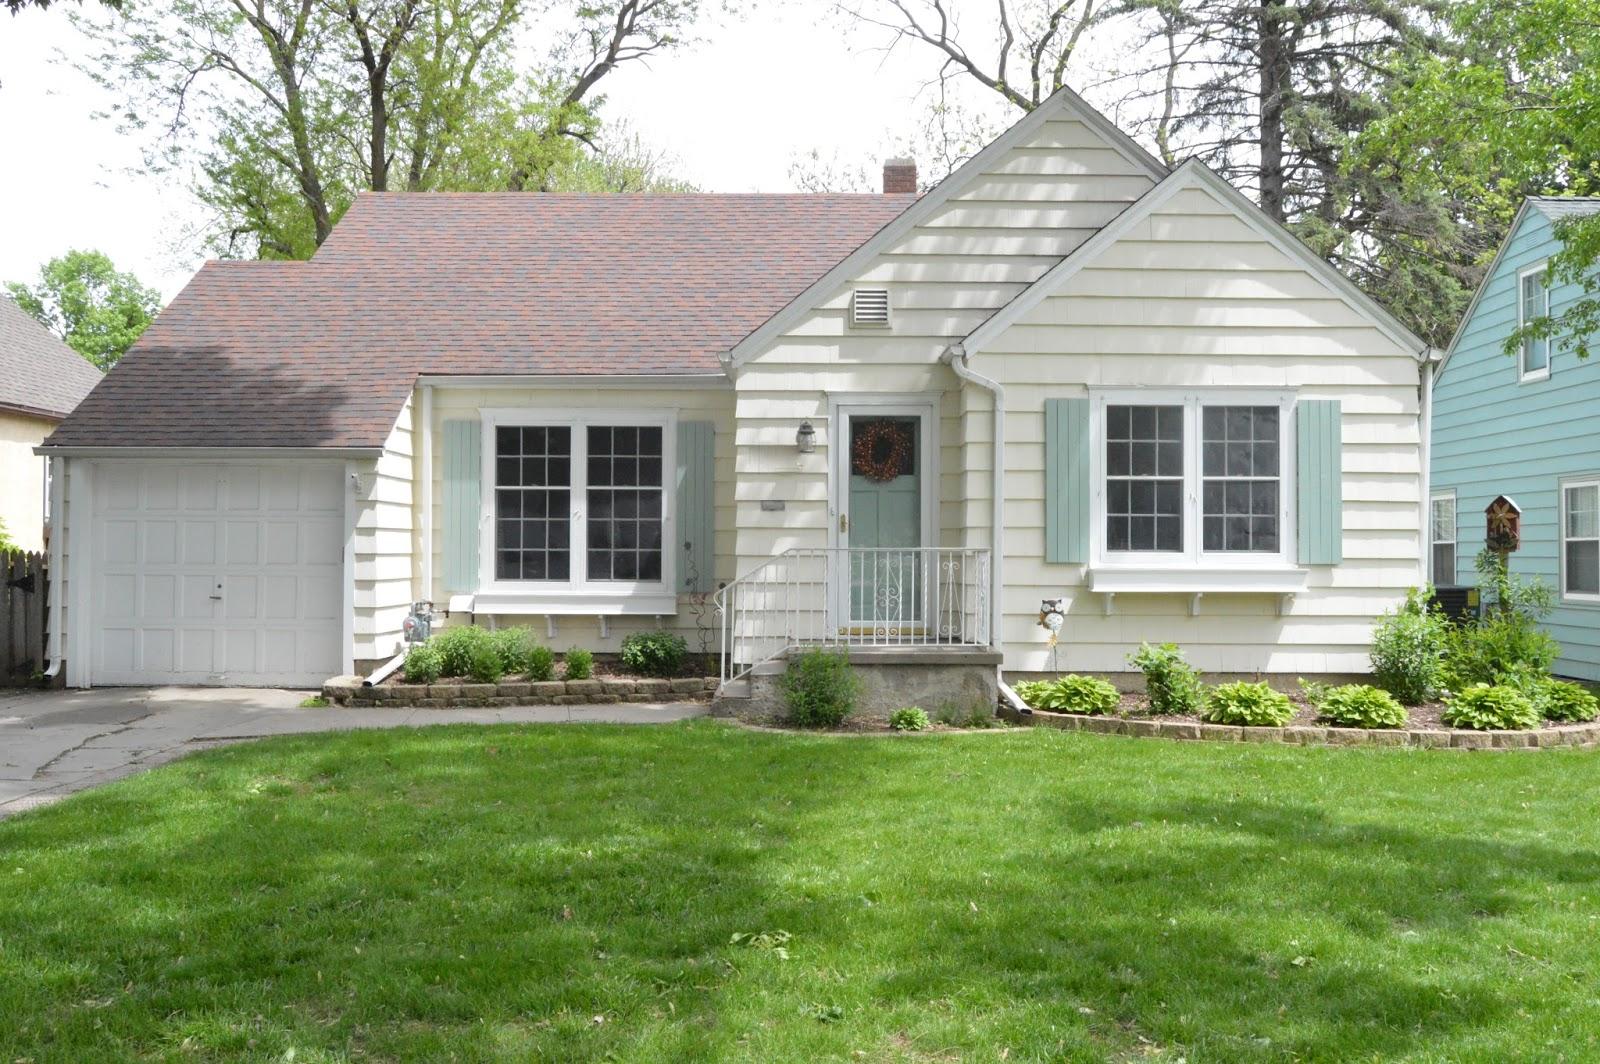 Exterior Home Colors: KRUSE'S WORKSHOP: A New Exterior House Color